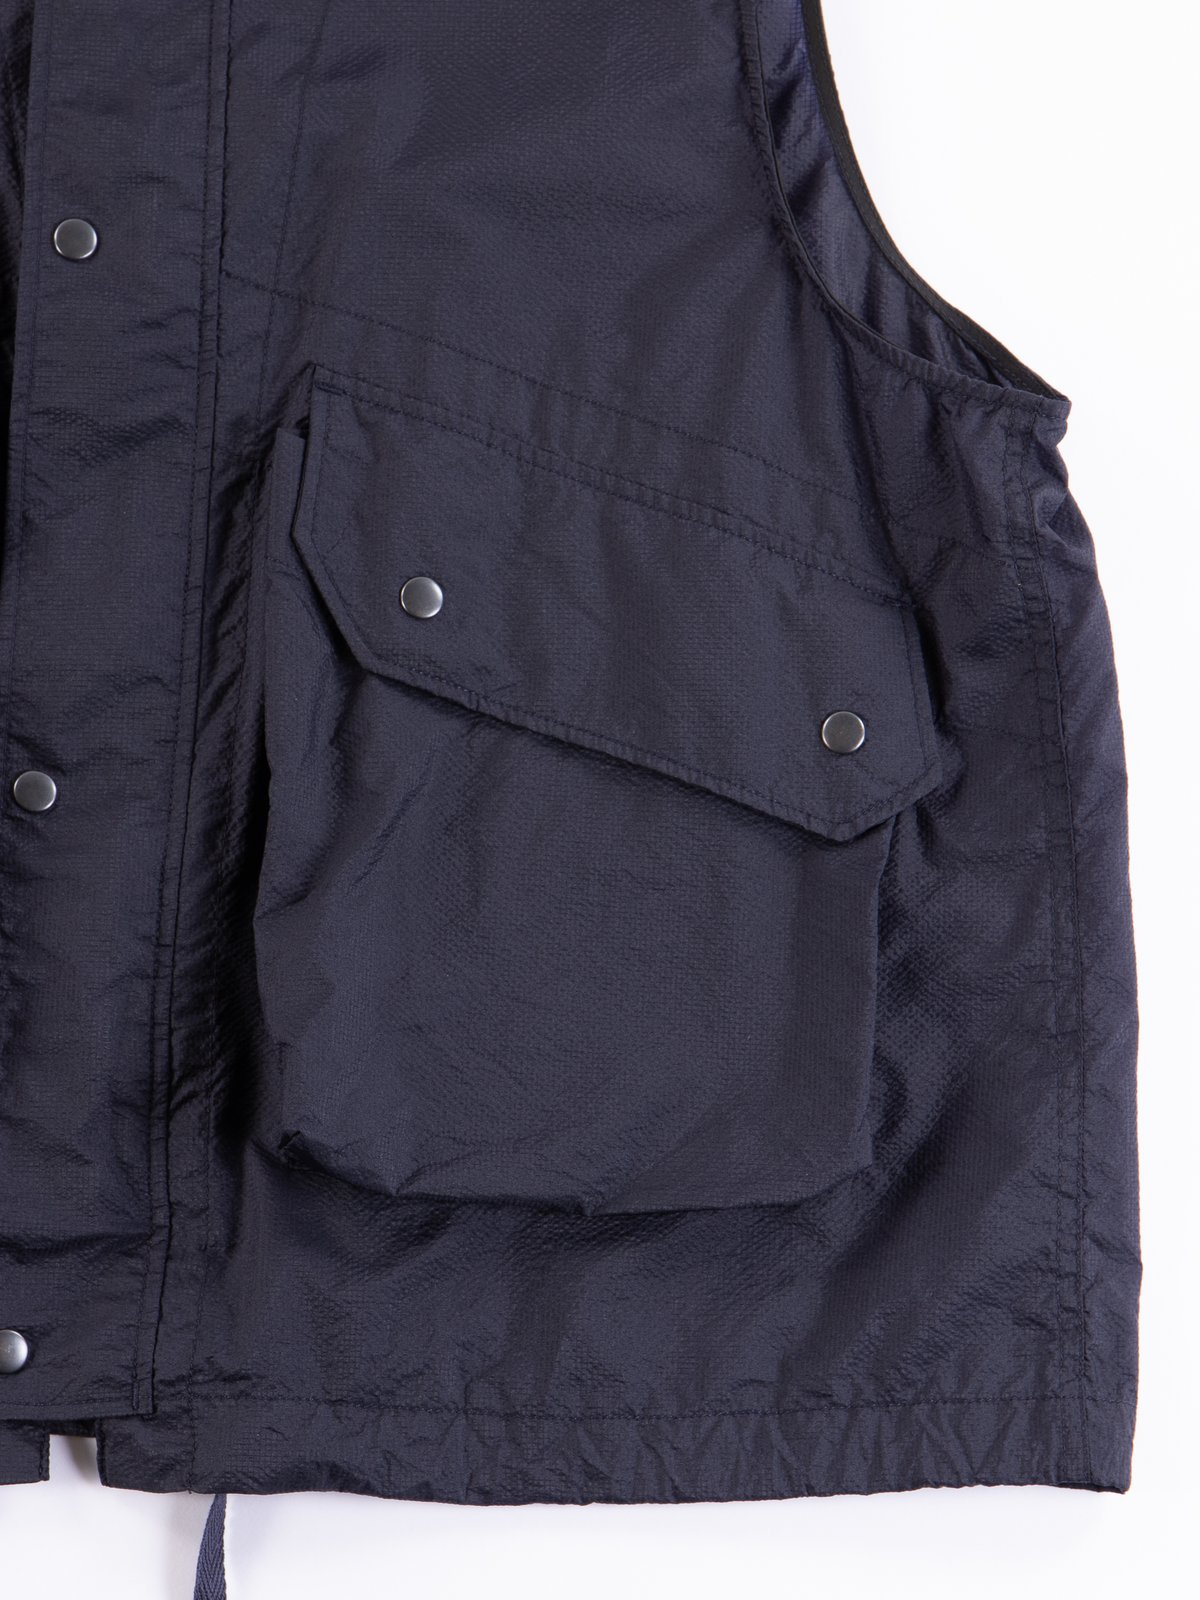 Dark Navy Nylon Micro Ripstop Field Vest - Image 4